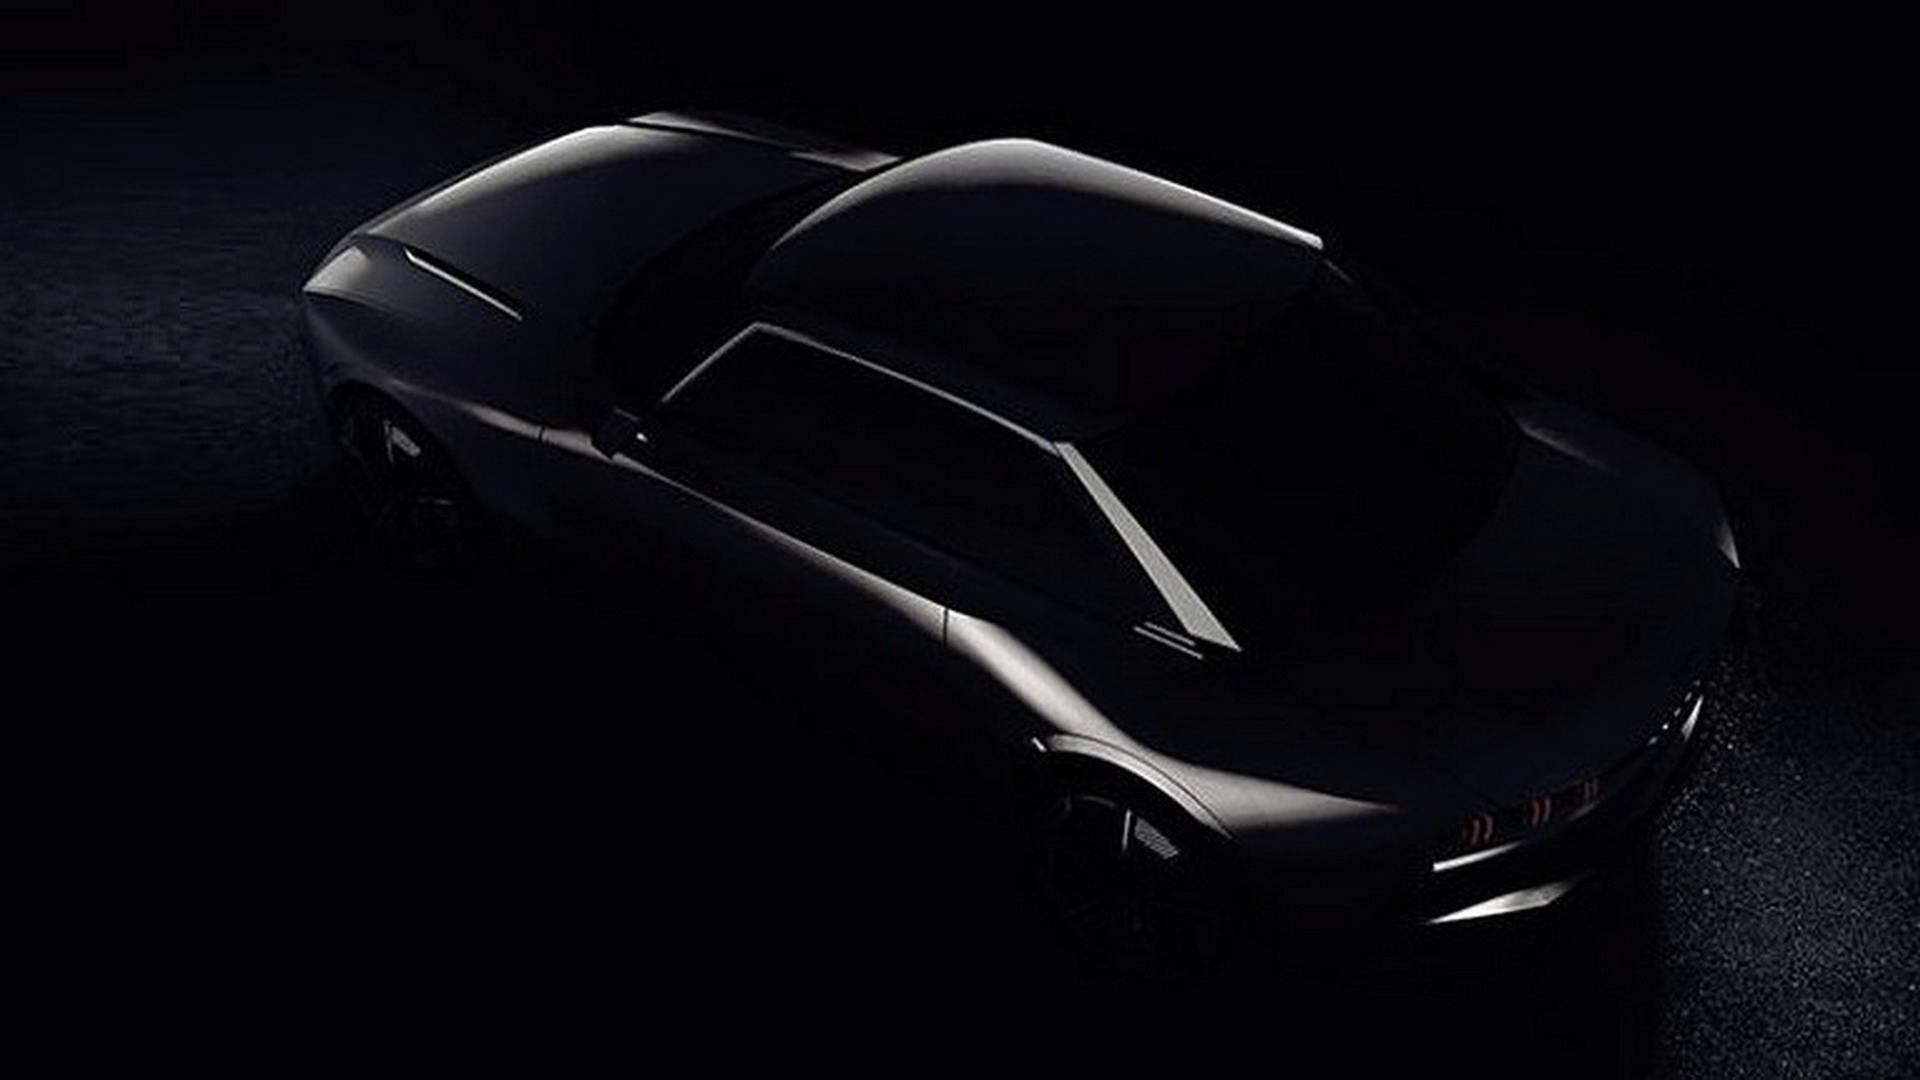 Peugeot je dve godine radio na konceptu spremnom za Pariz